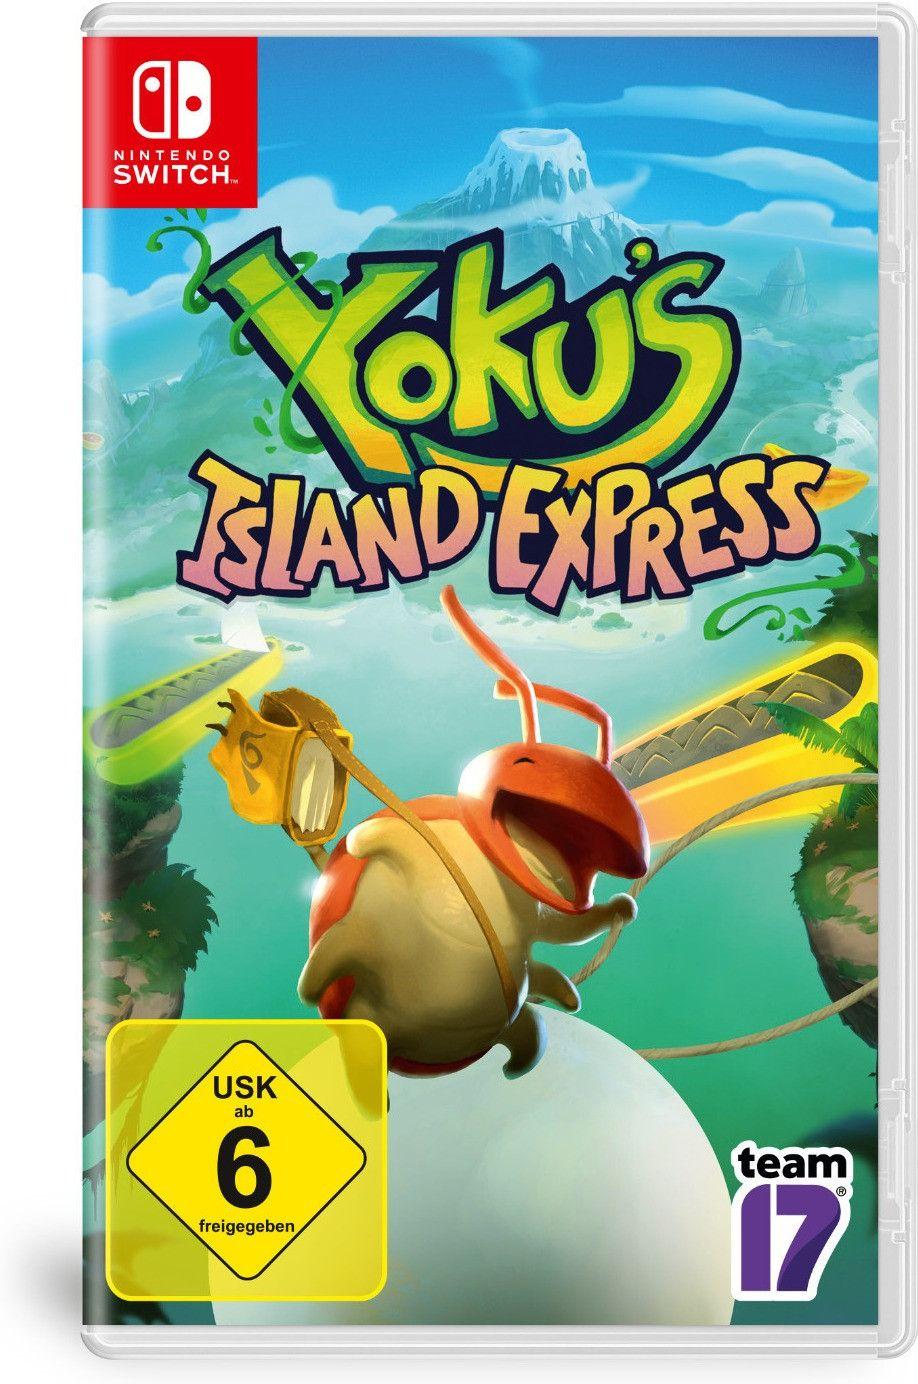 Yoku's Island Express - [Nintendo Switch] [Mediamarkt Abholung]